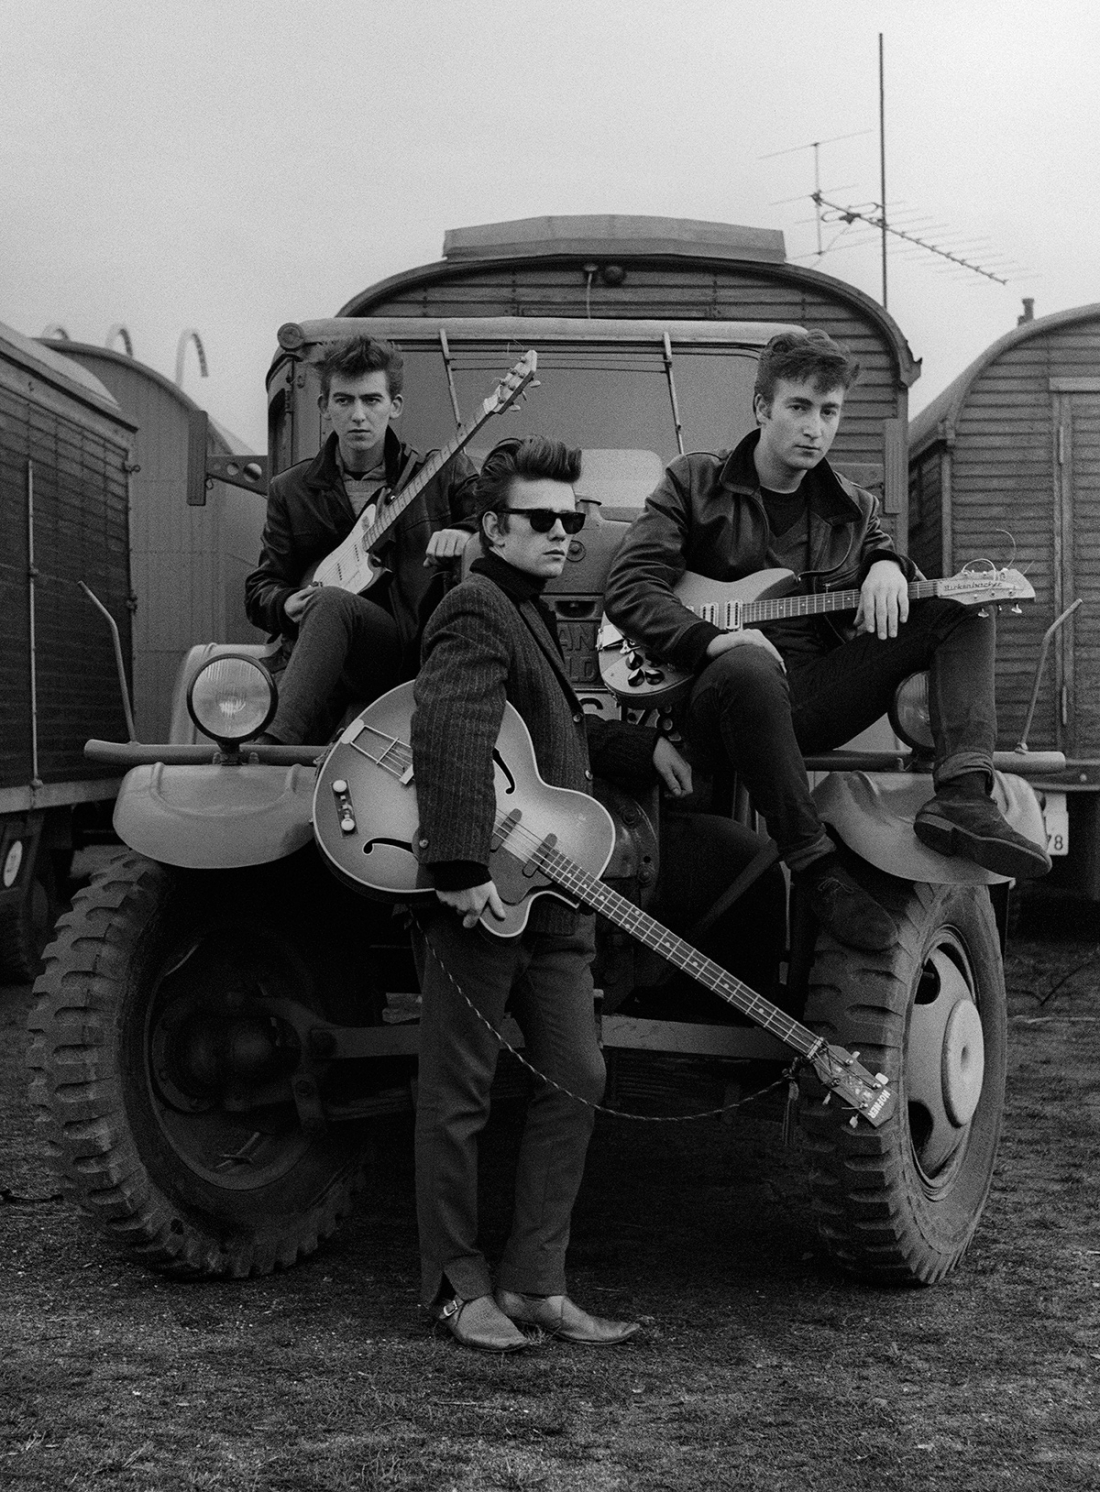 Astrid Kirchherr,  John Lennon, Stuart Sutcliffe and George Harrison  on a truck at the fairground, 1960